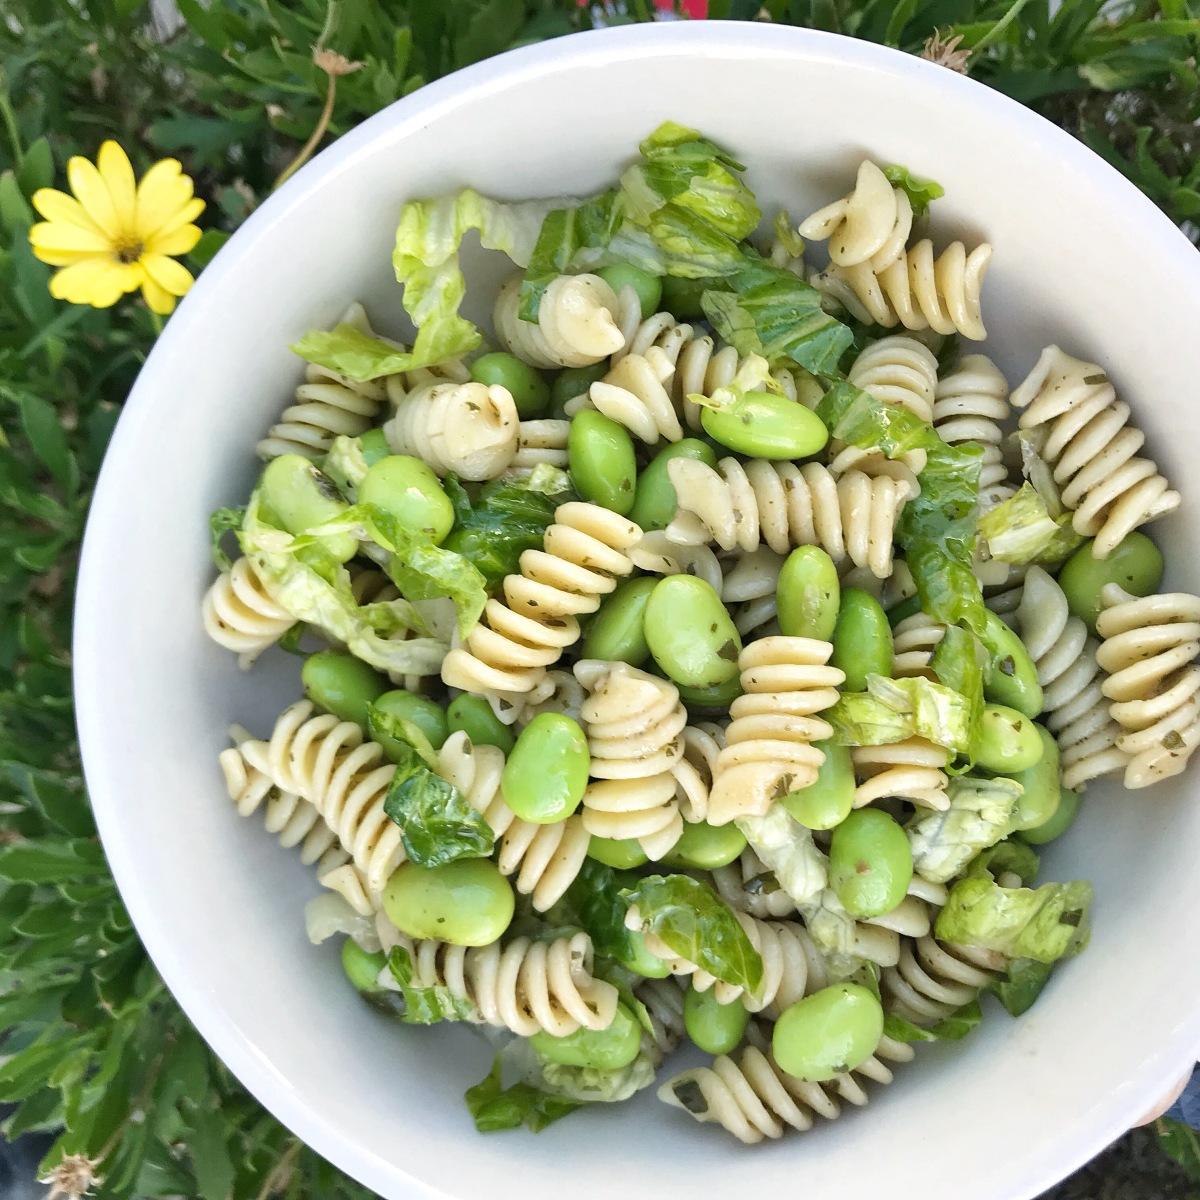 Edamame & Pesto Pasta Salad